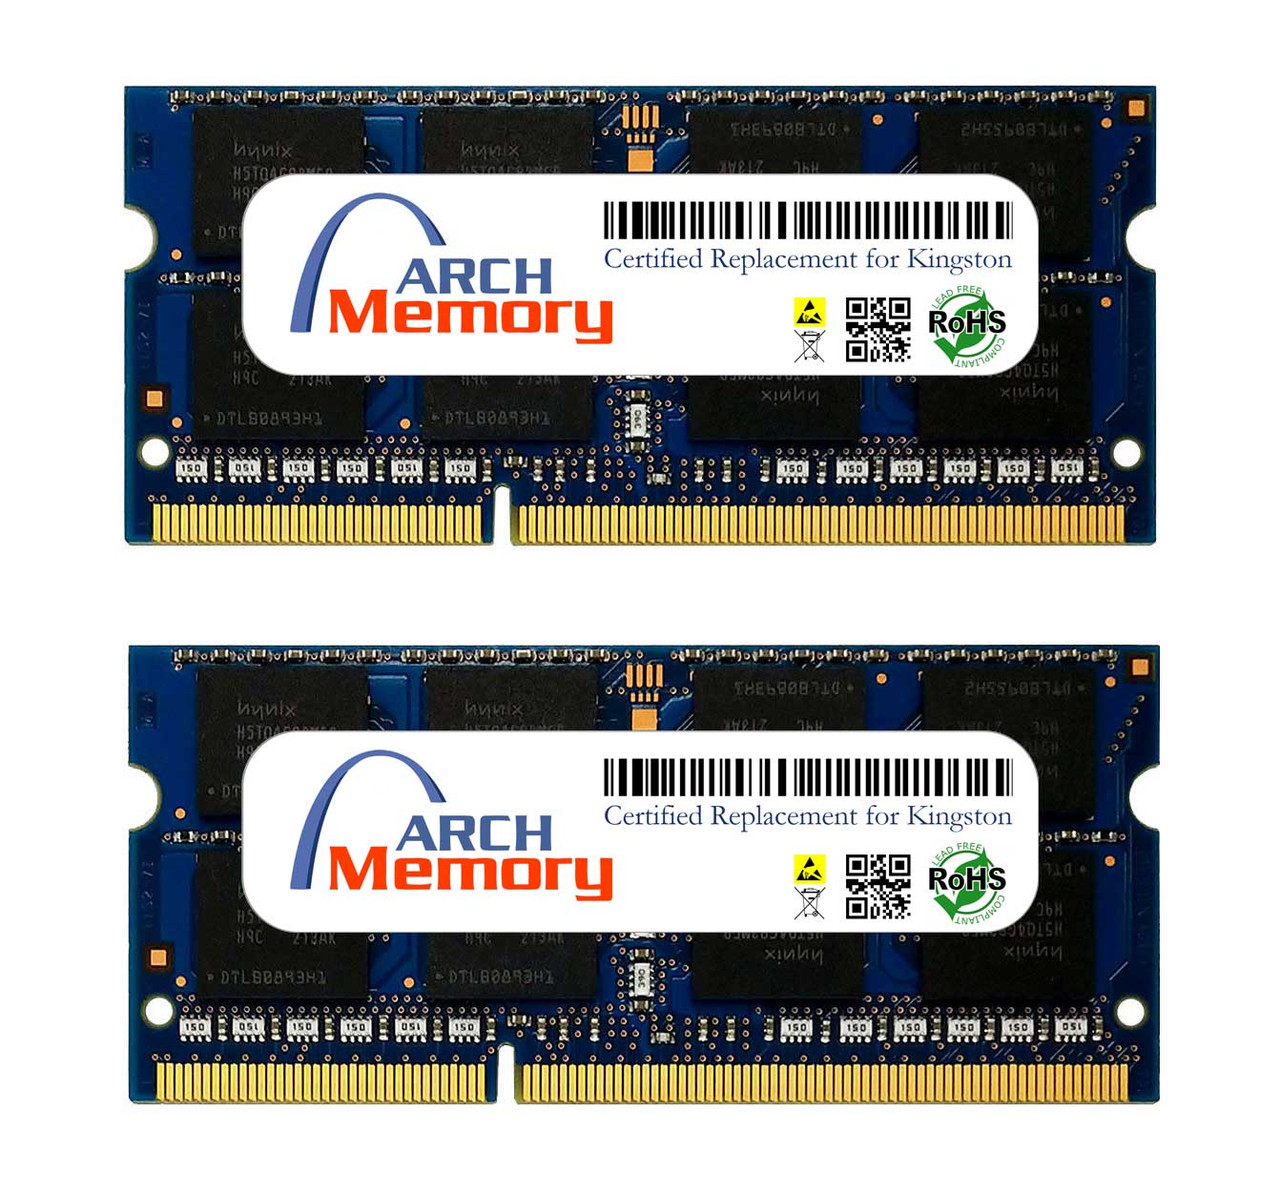 8GB KTA-MB1600LK2/16G Kit (2 x 8 GB) DDR3L 1600MHz 204-Pin SODIMM RAM | Kingston Replacement Memory